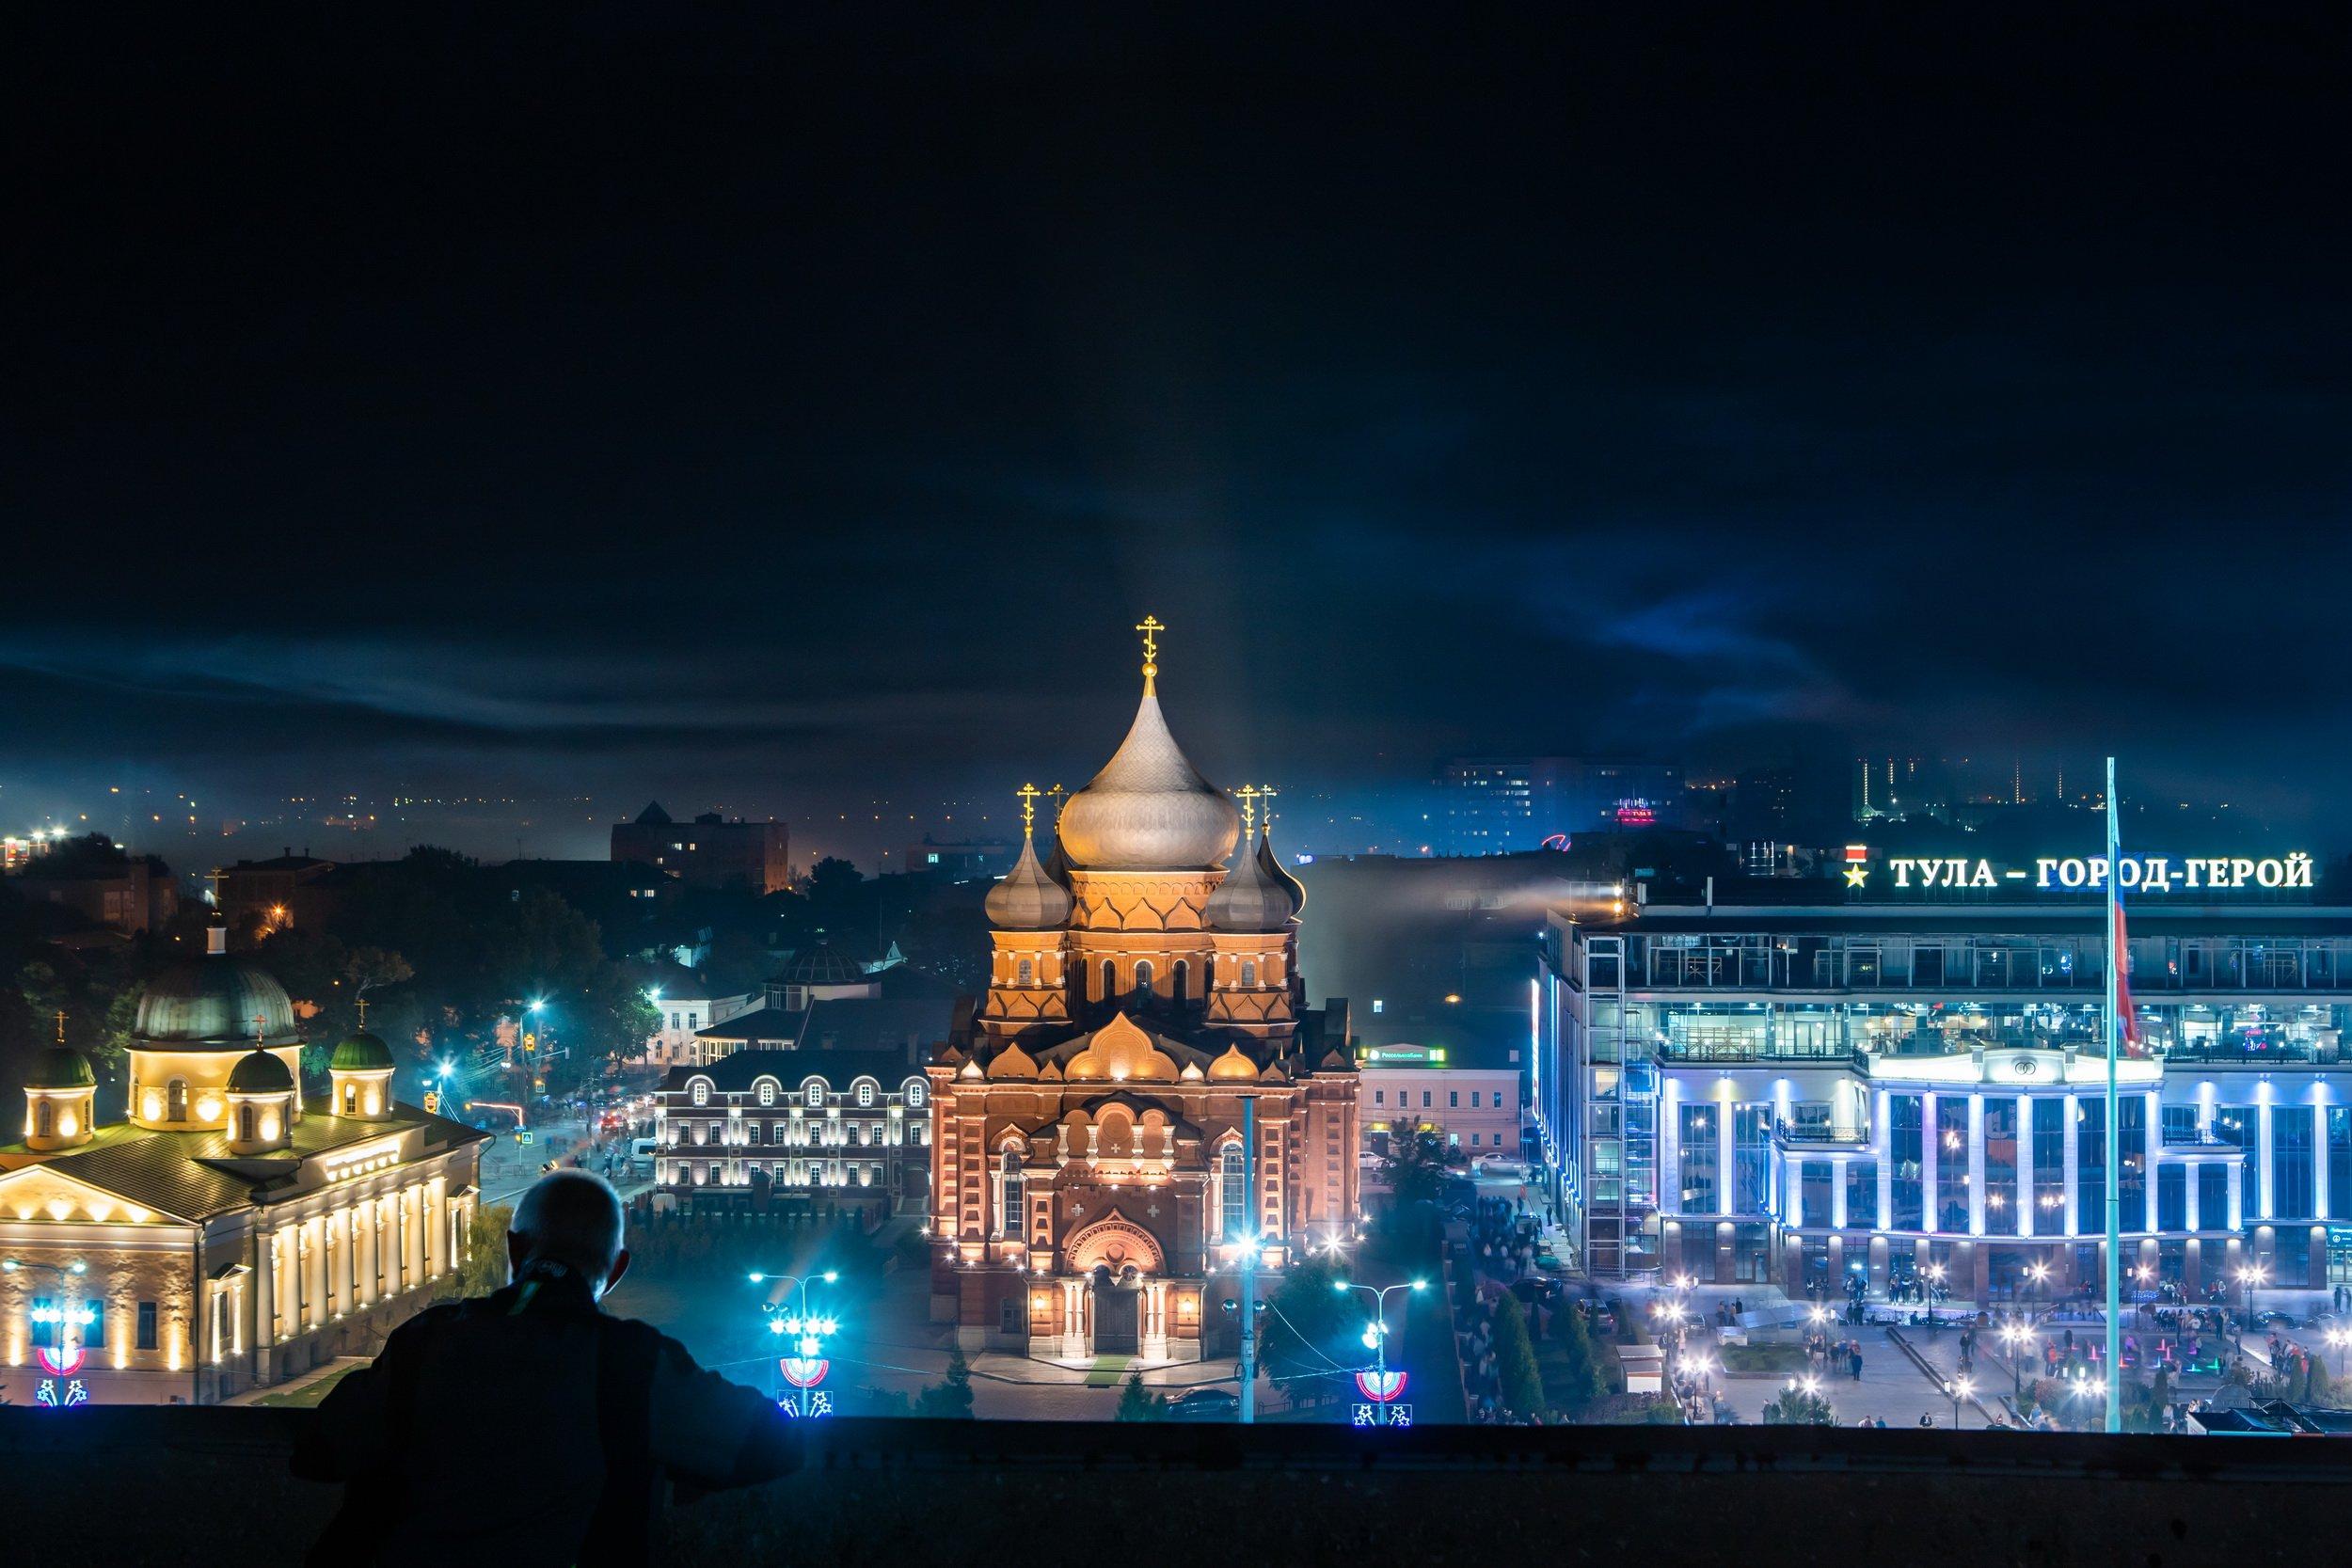 тула, Пирязев Алексей